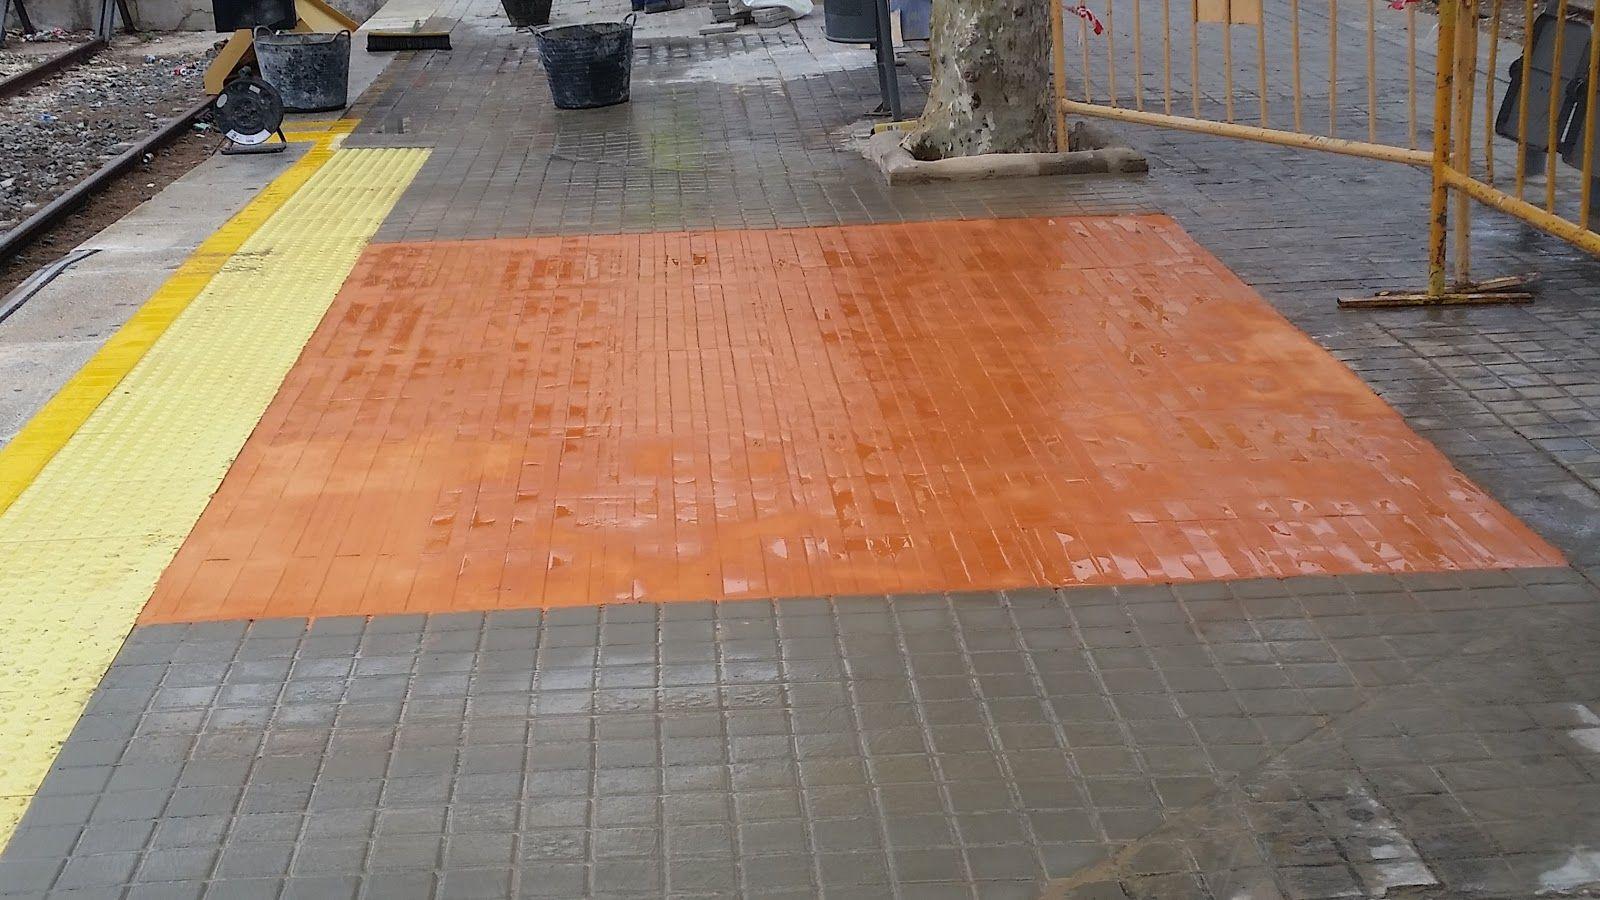 Pavimento impreso de color naranja